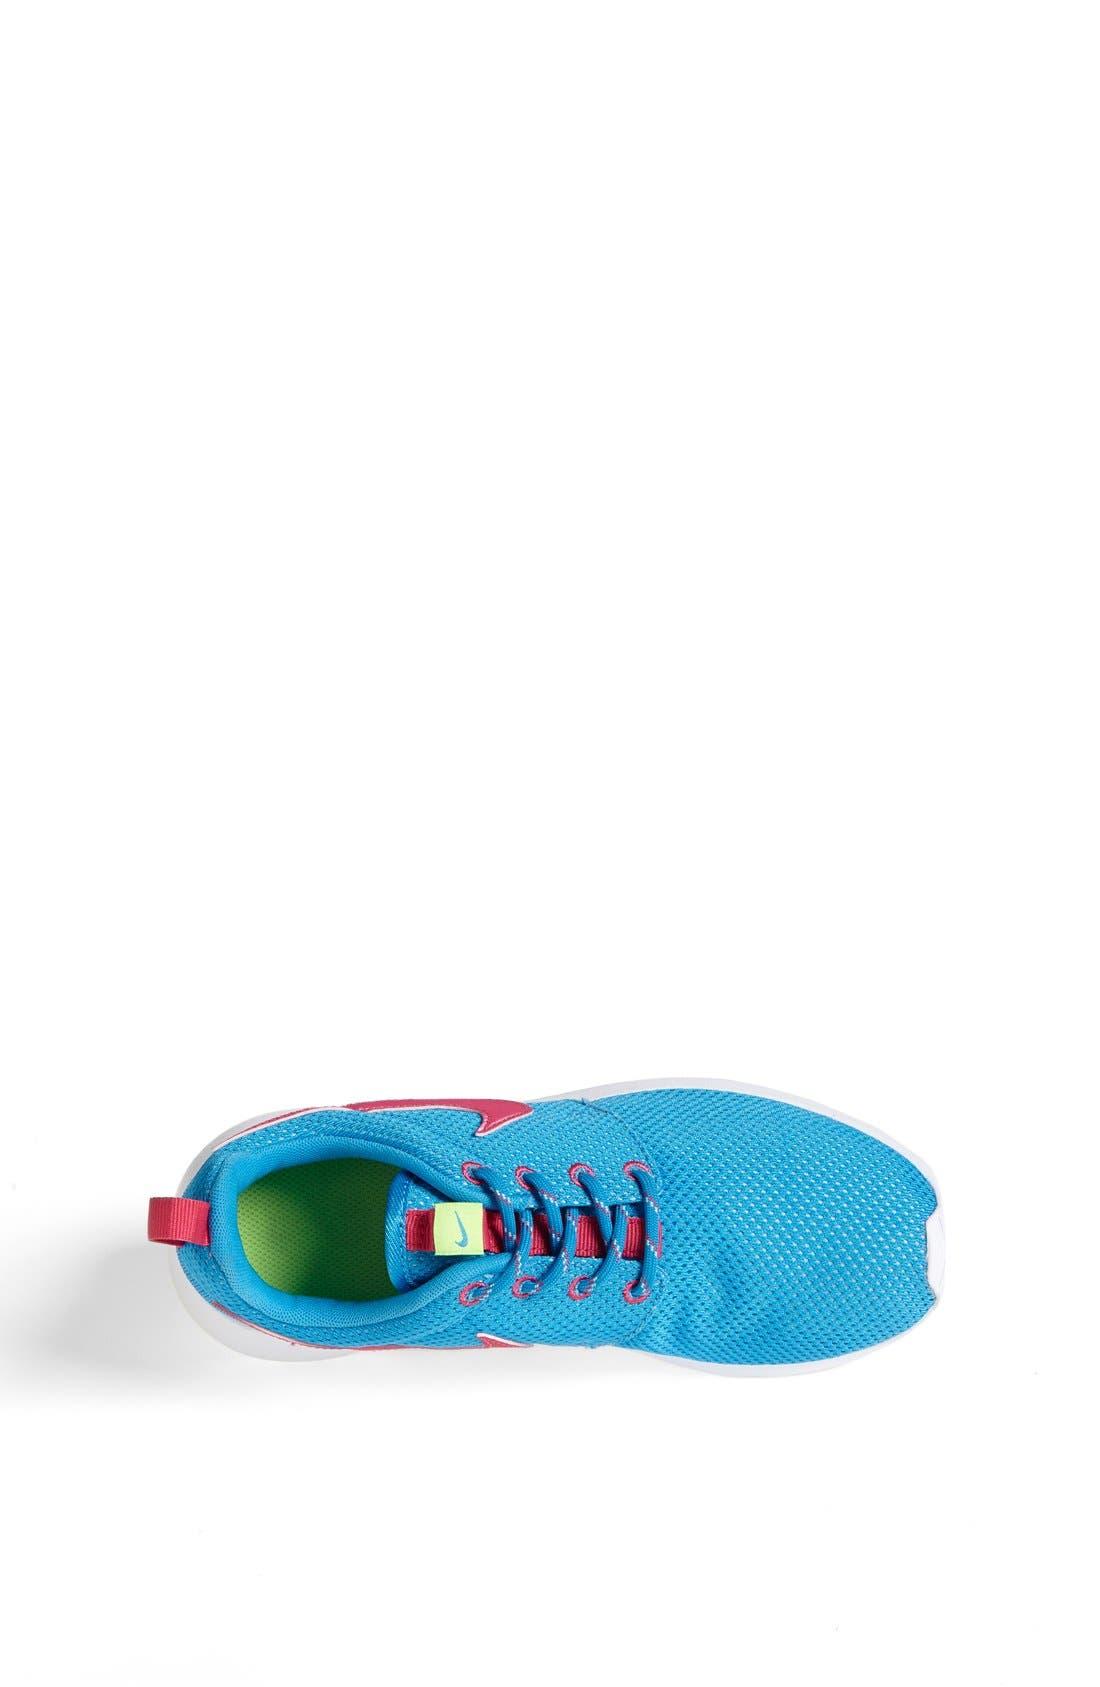 'Roshe Run' Athletic Shoe,                             Alternate thumbnail 85, color,